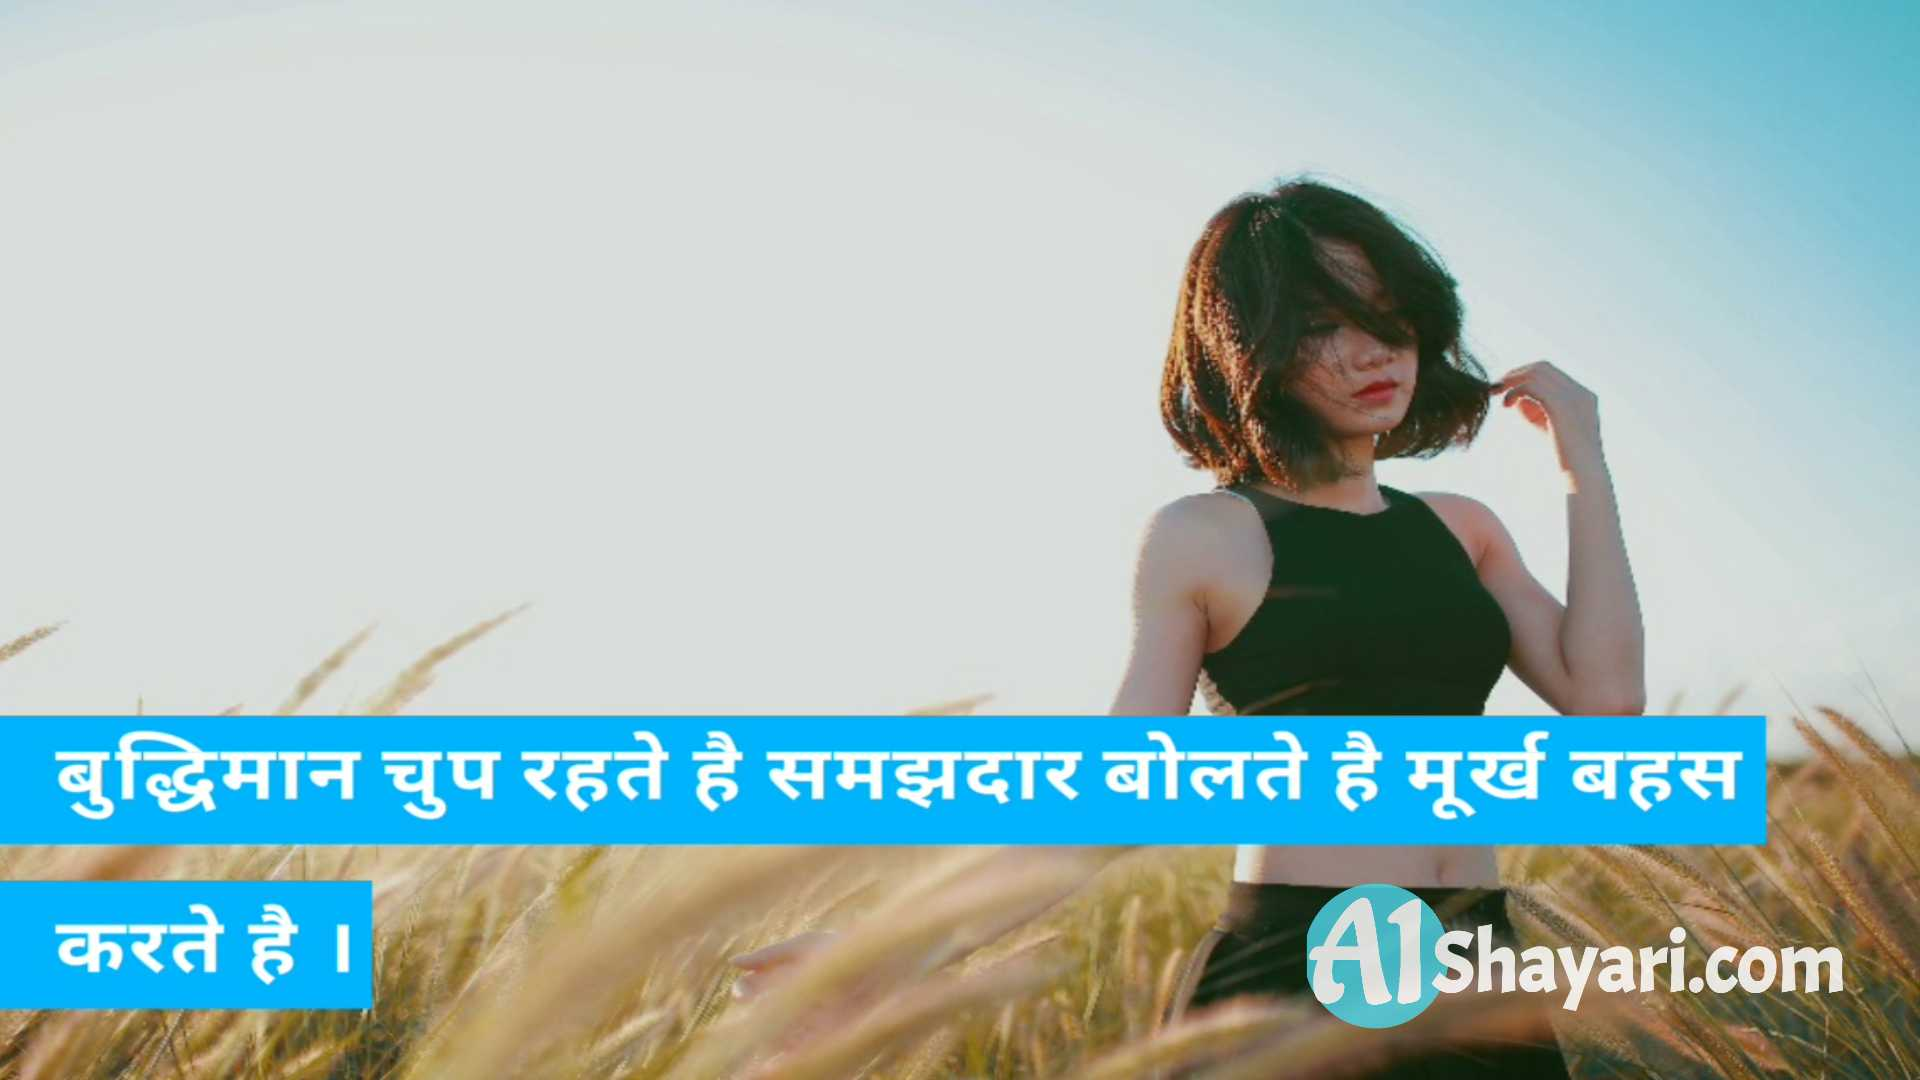 Achhe Vichar In Hindi Image